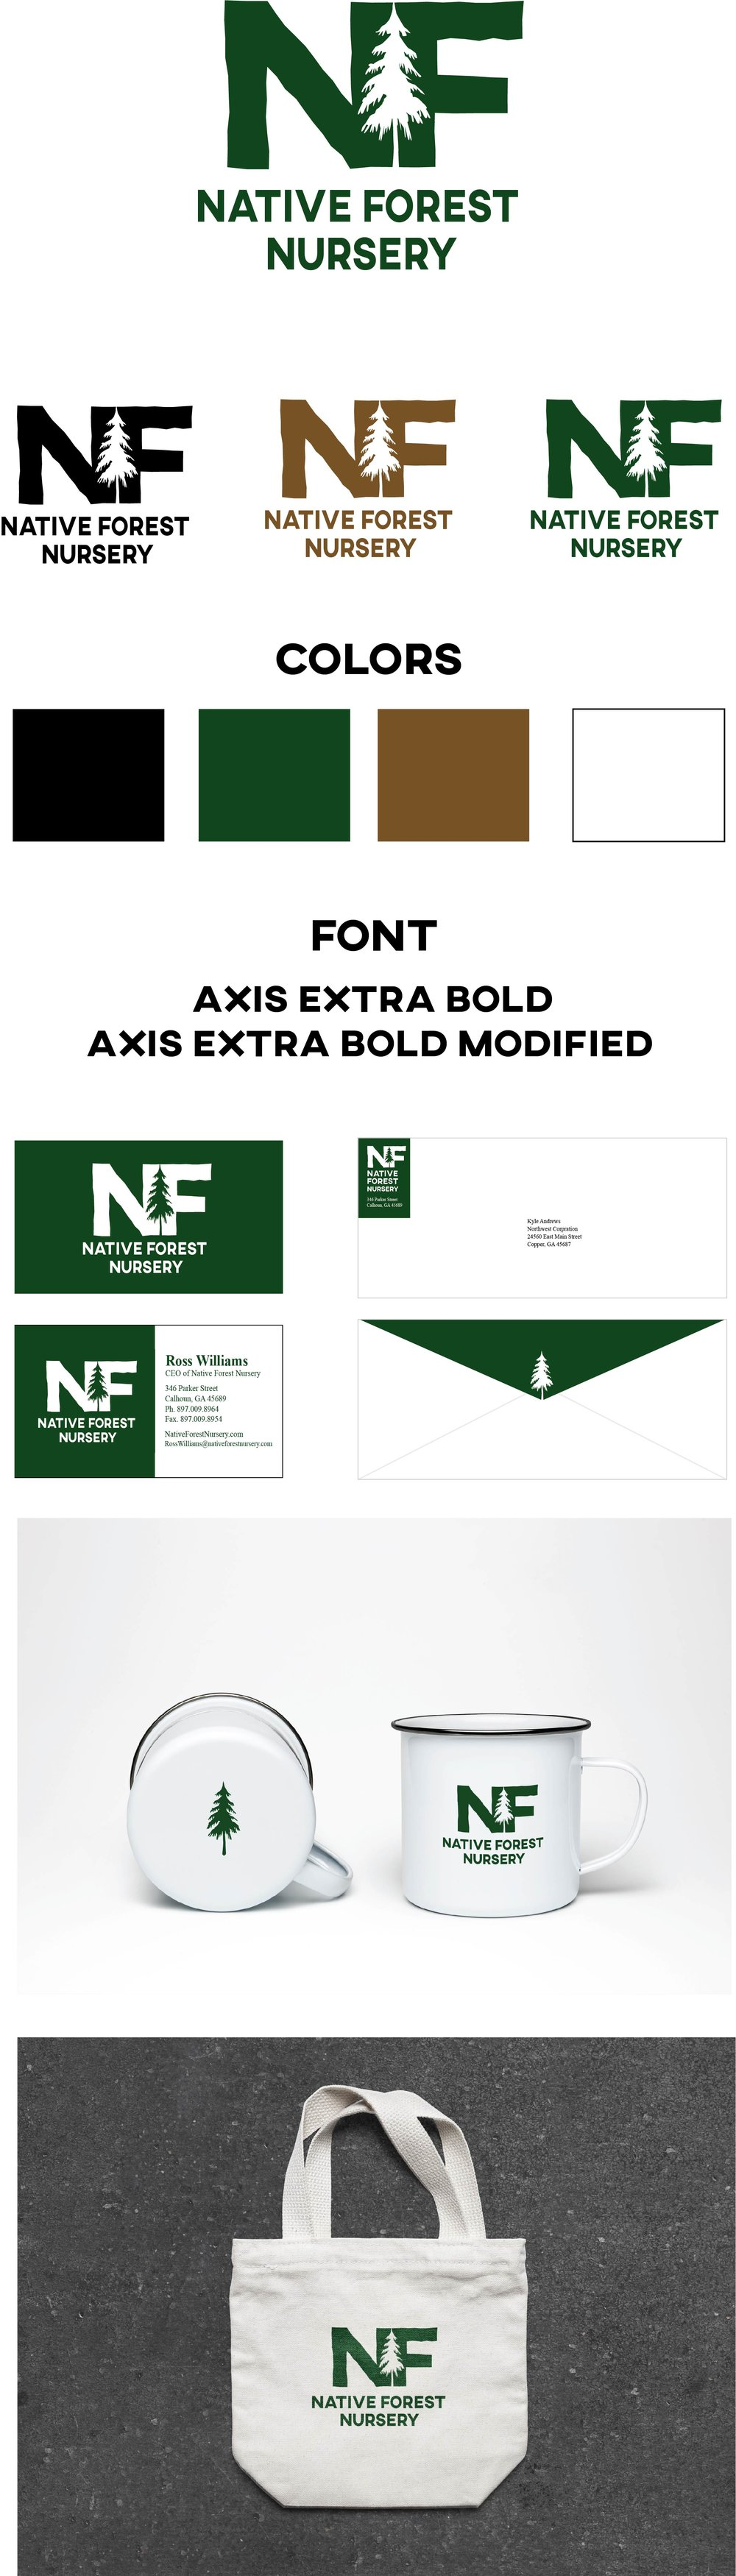 NF Process.jpg